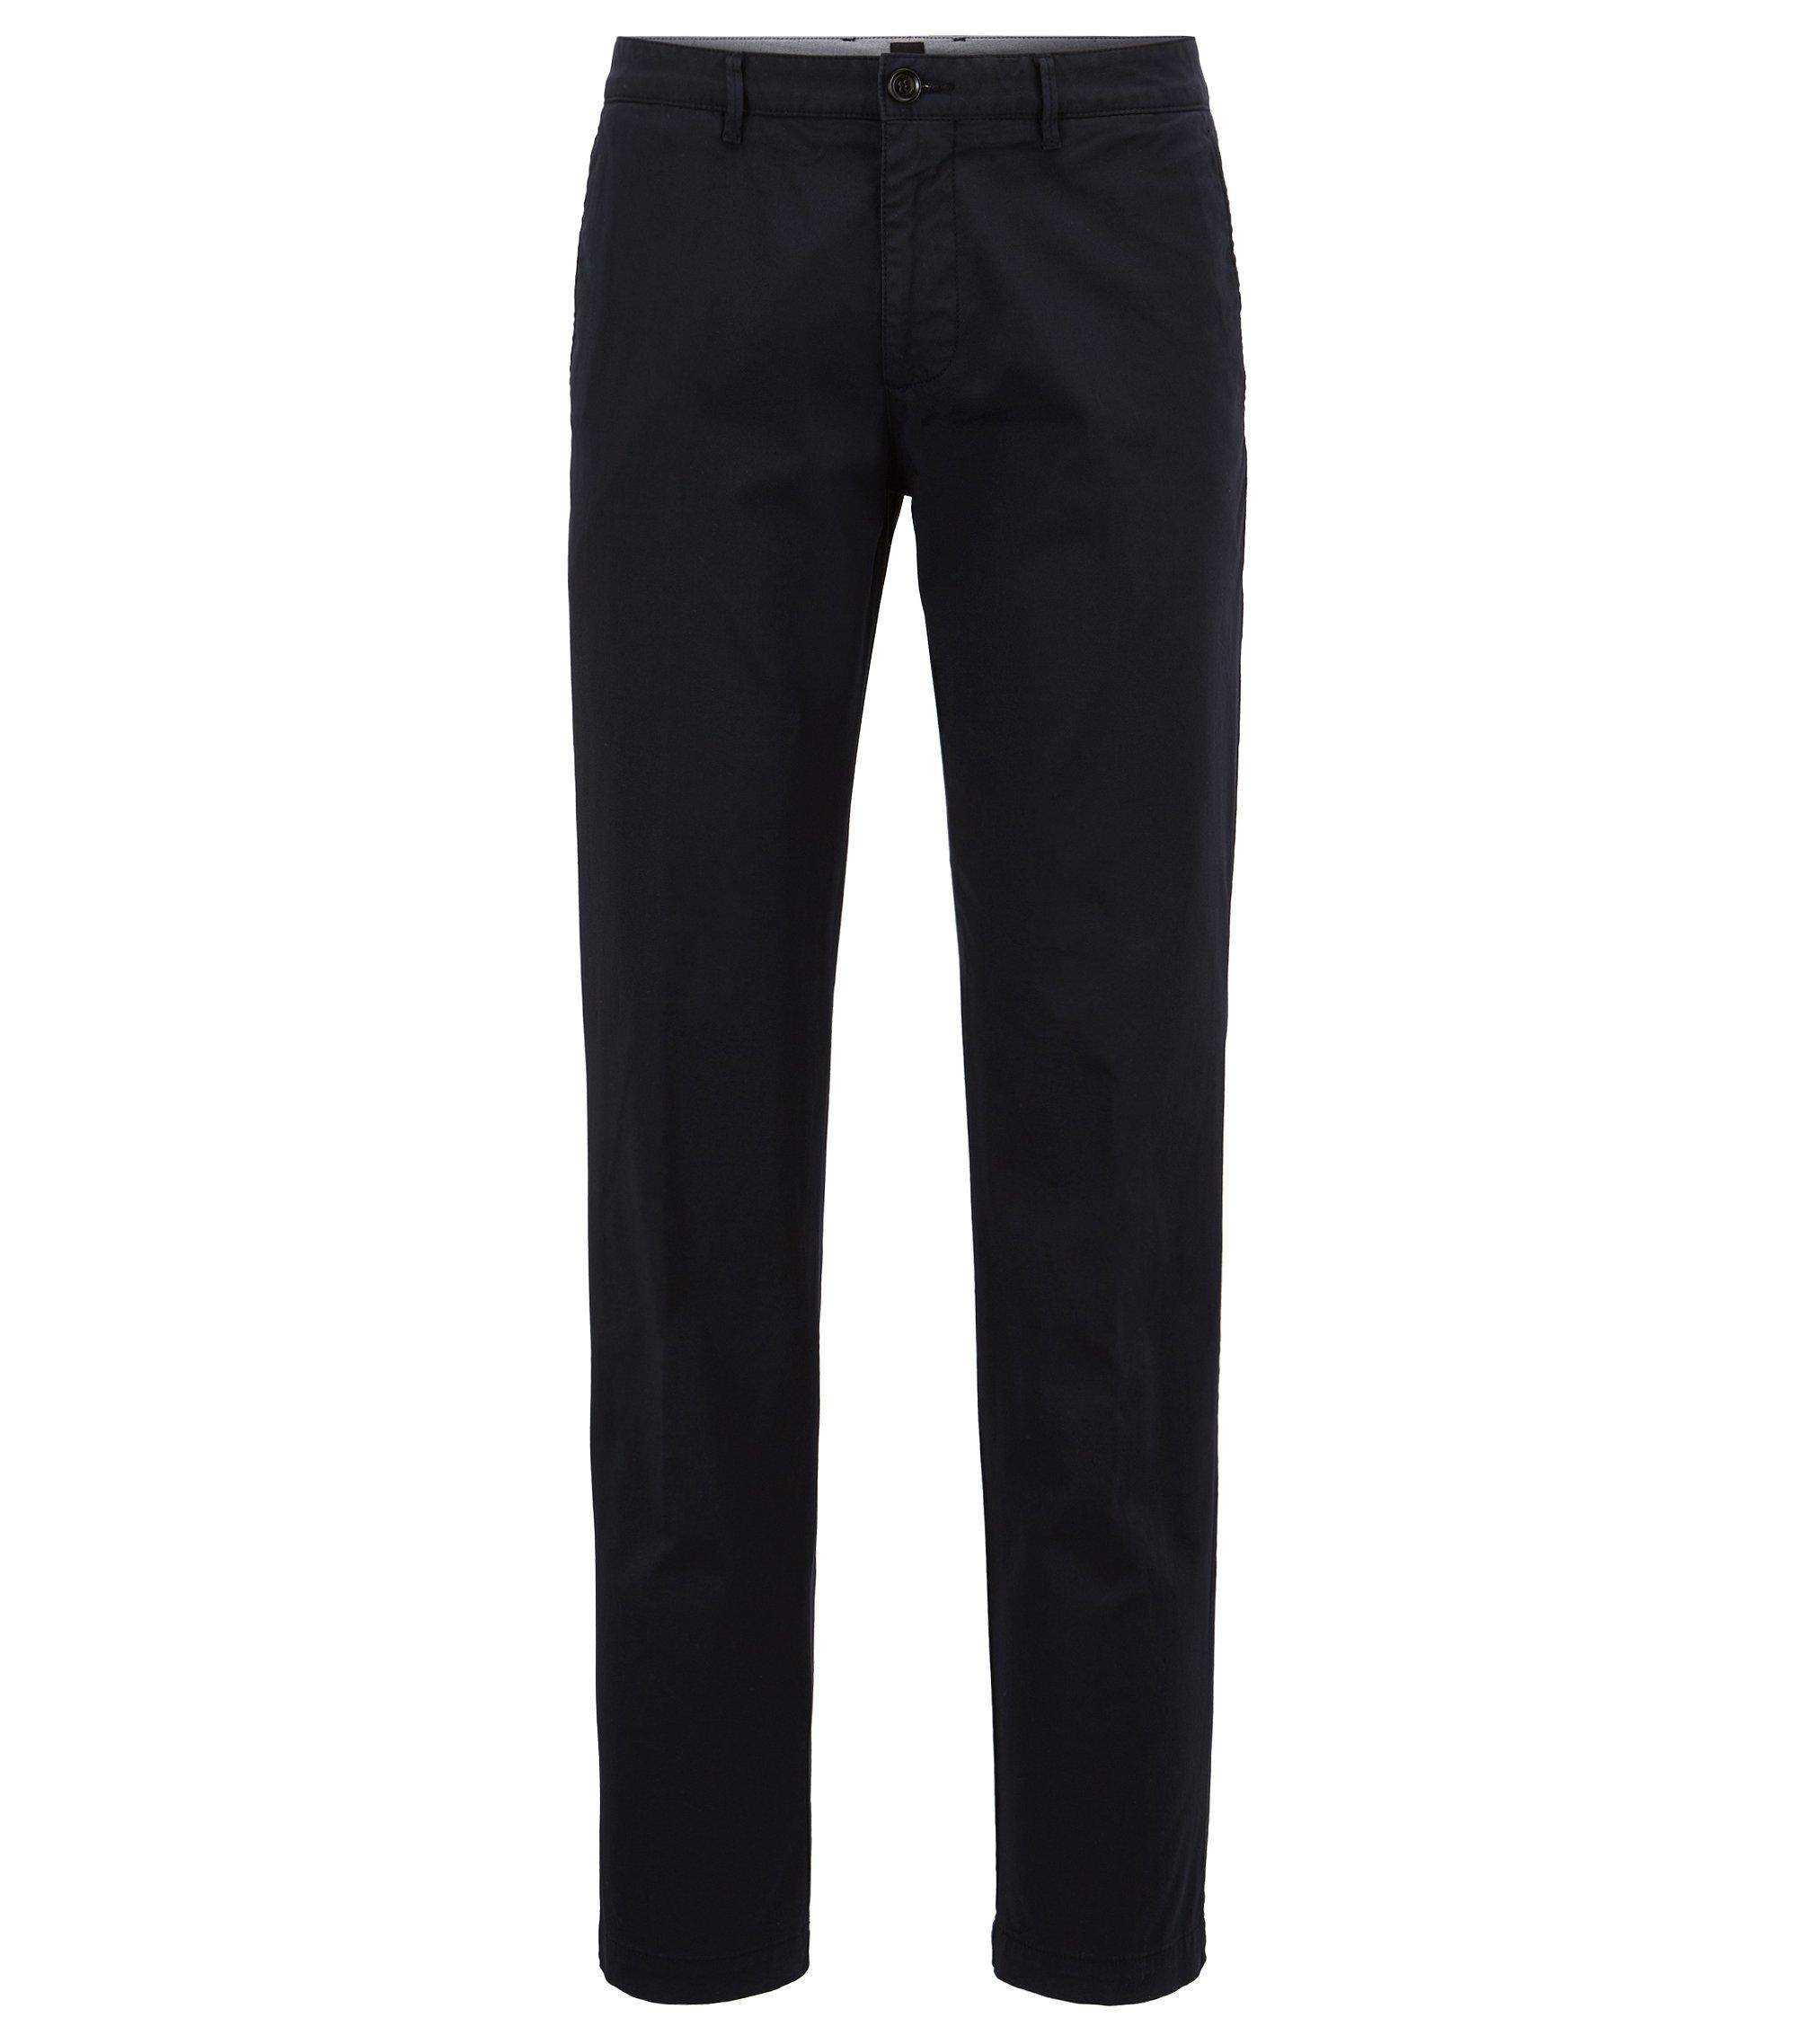 Stretch Cotton Pant, Regular Fit | Crigan D, Dark Blue